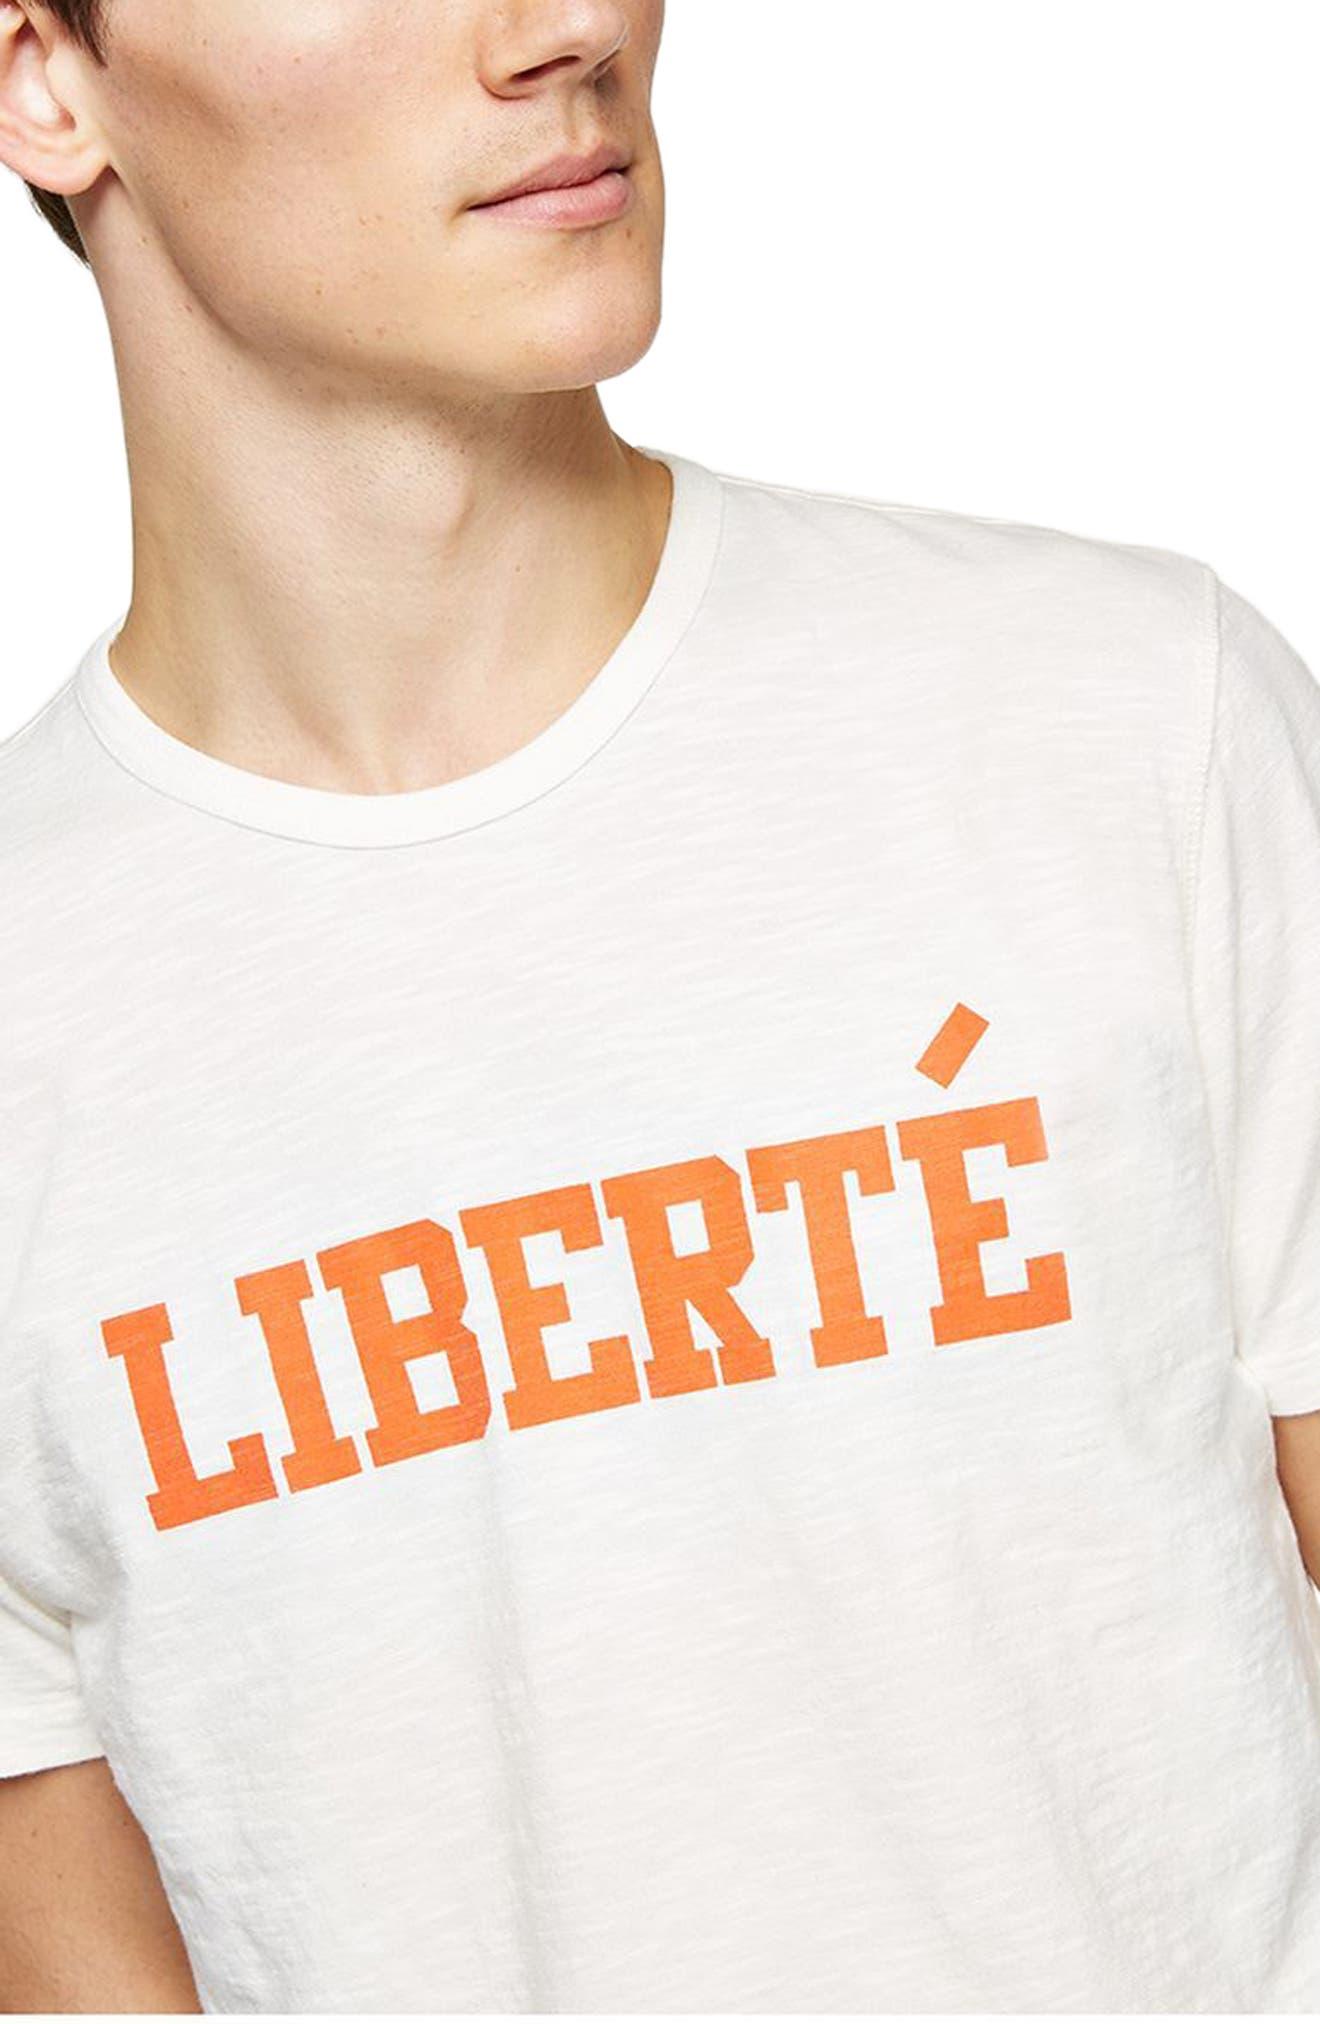 Liberté Graphic T-Shirt,                             Alternate thumbnail 3, color,                             White Multi